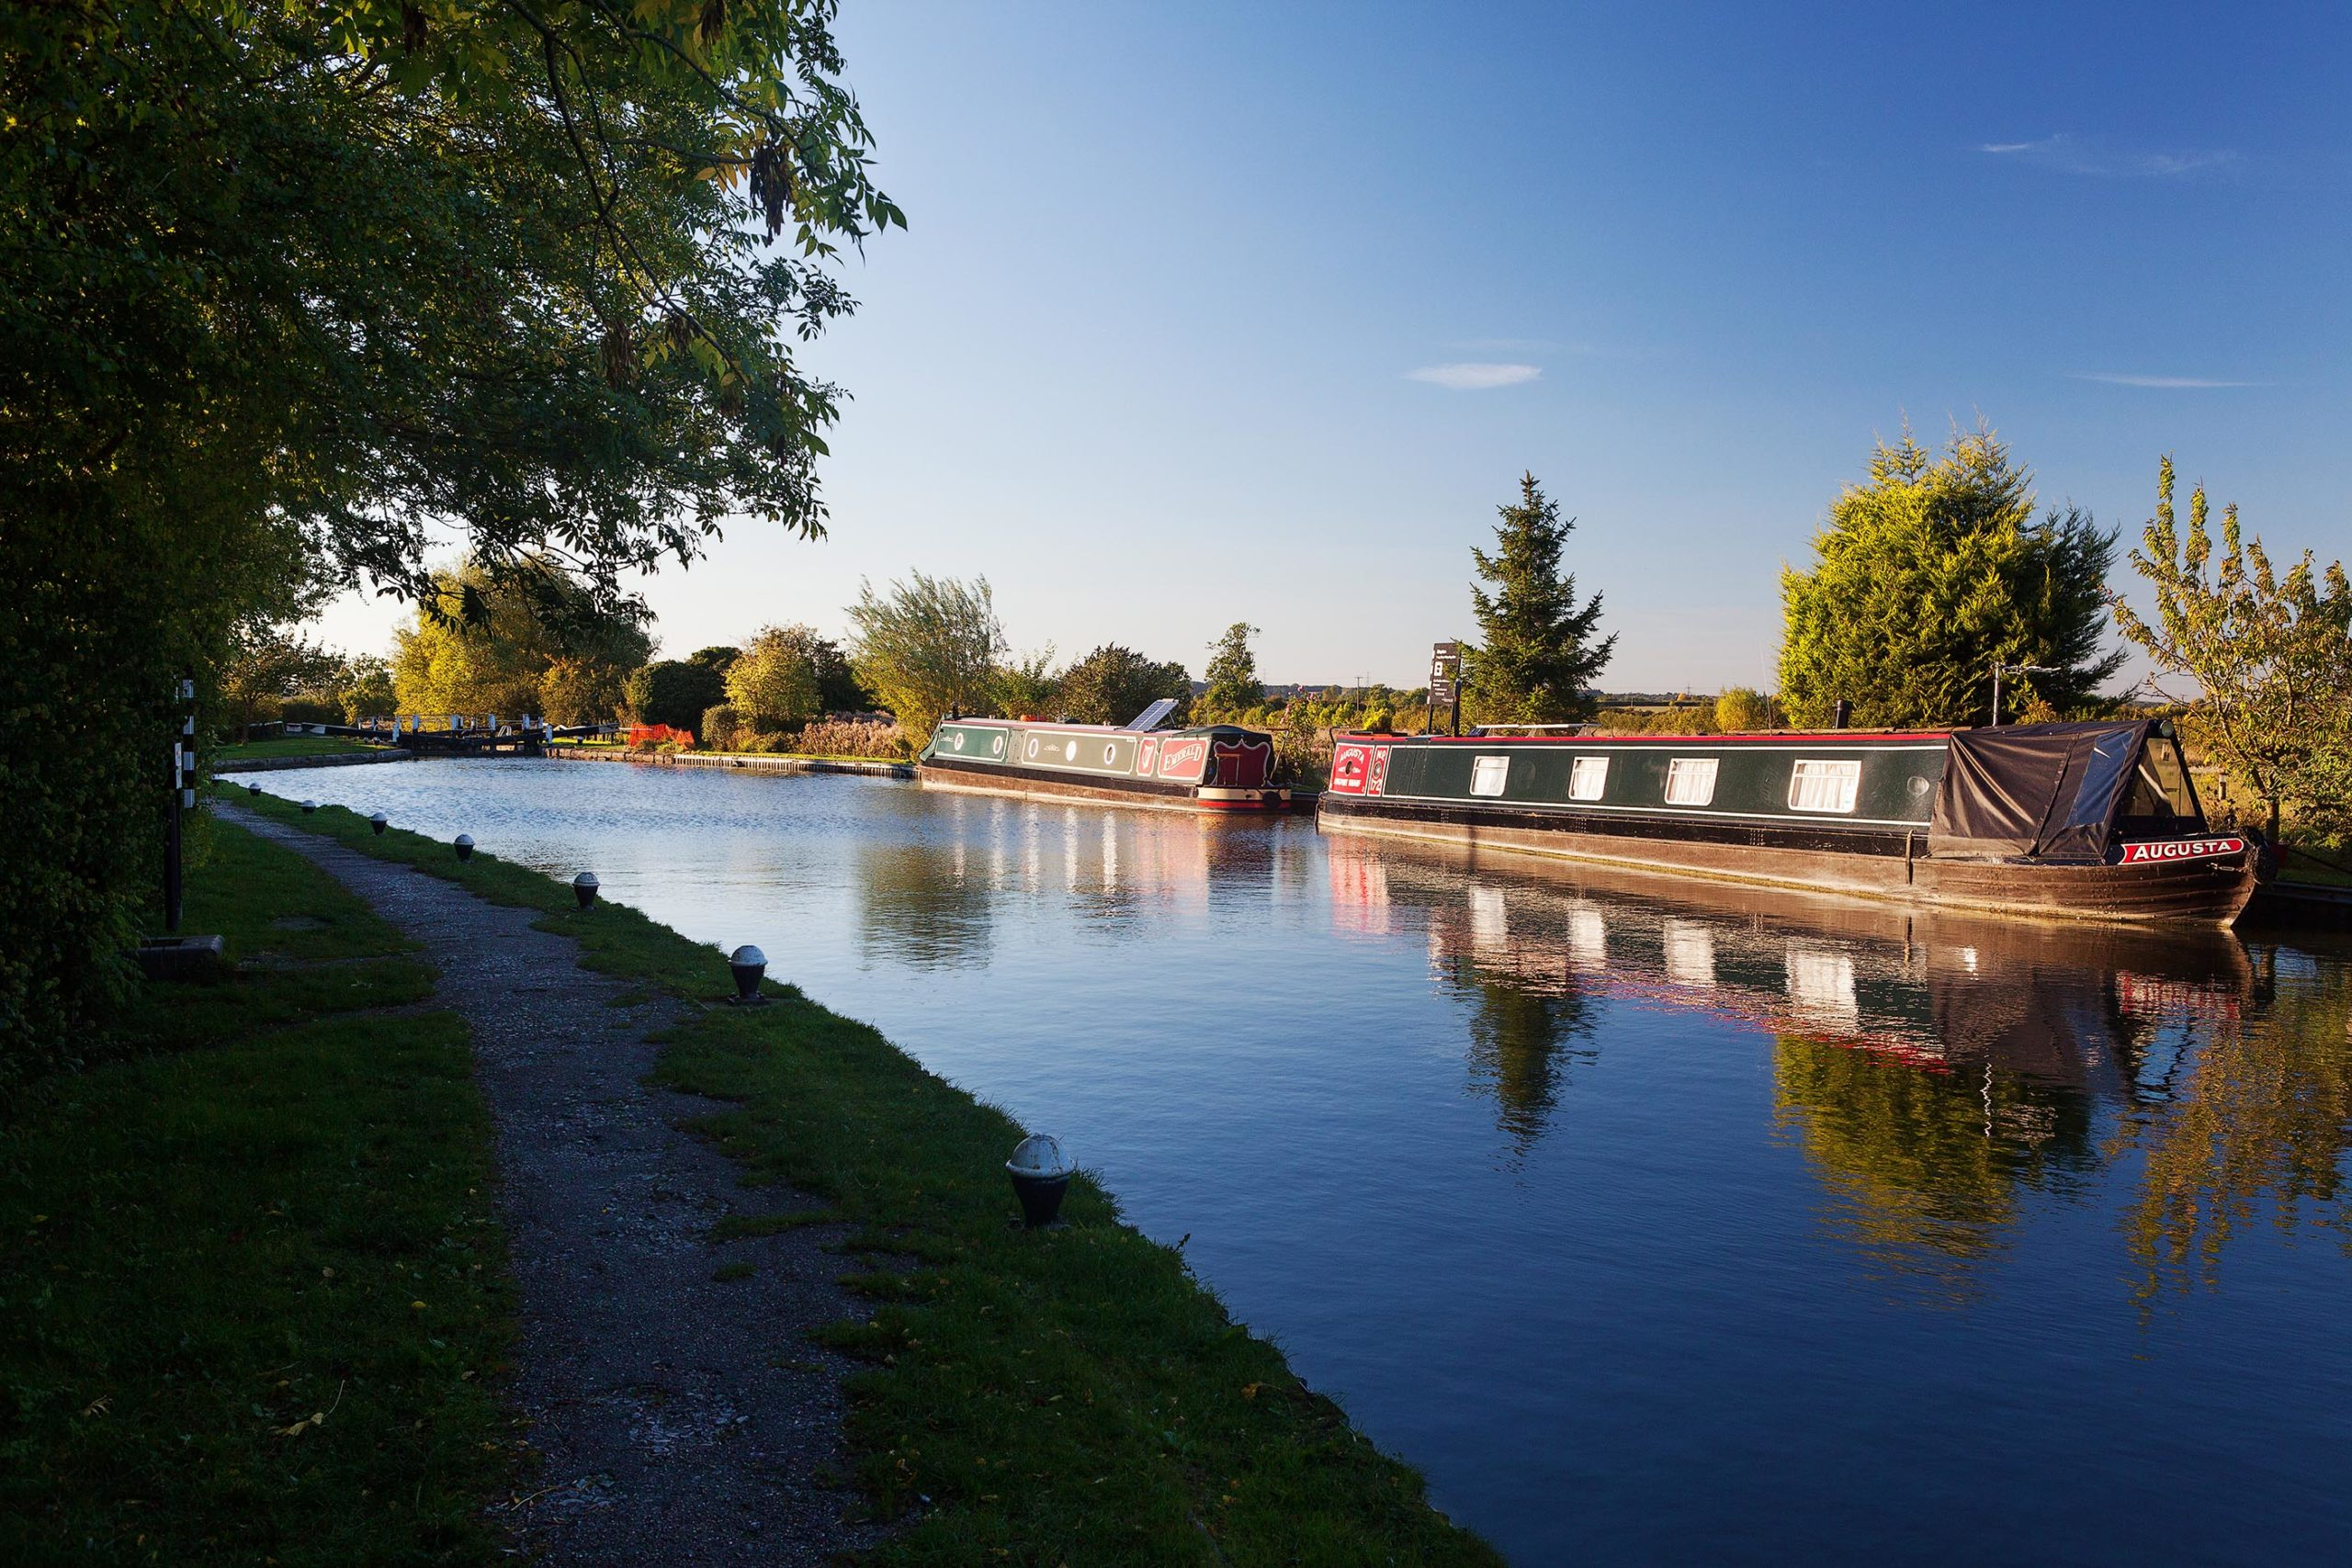 Grand Union Canal at Slapton Lock